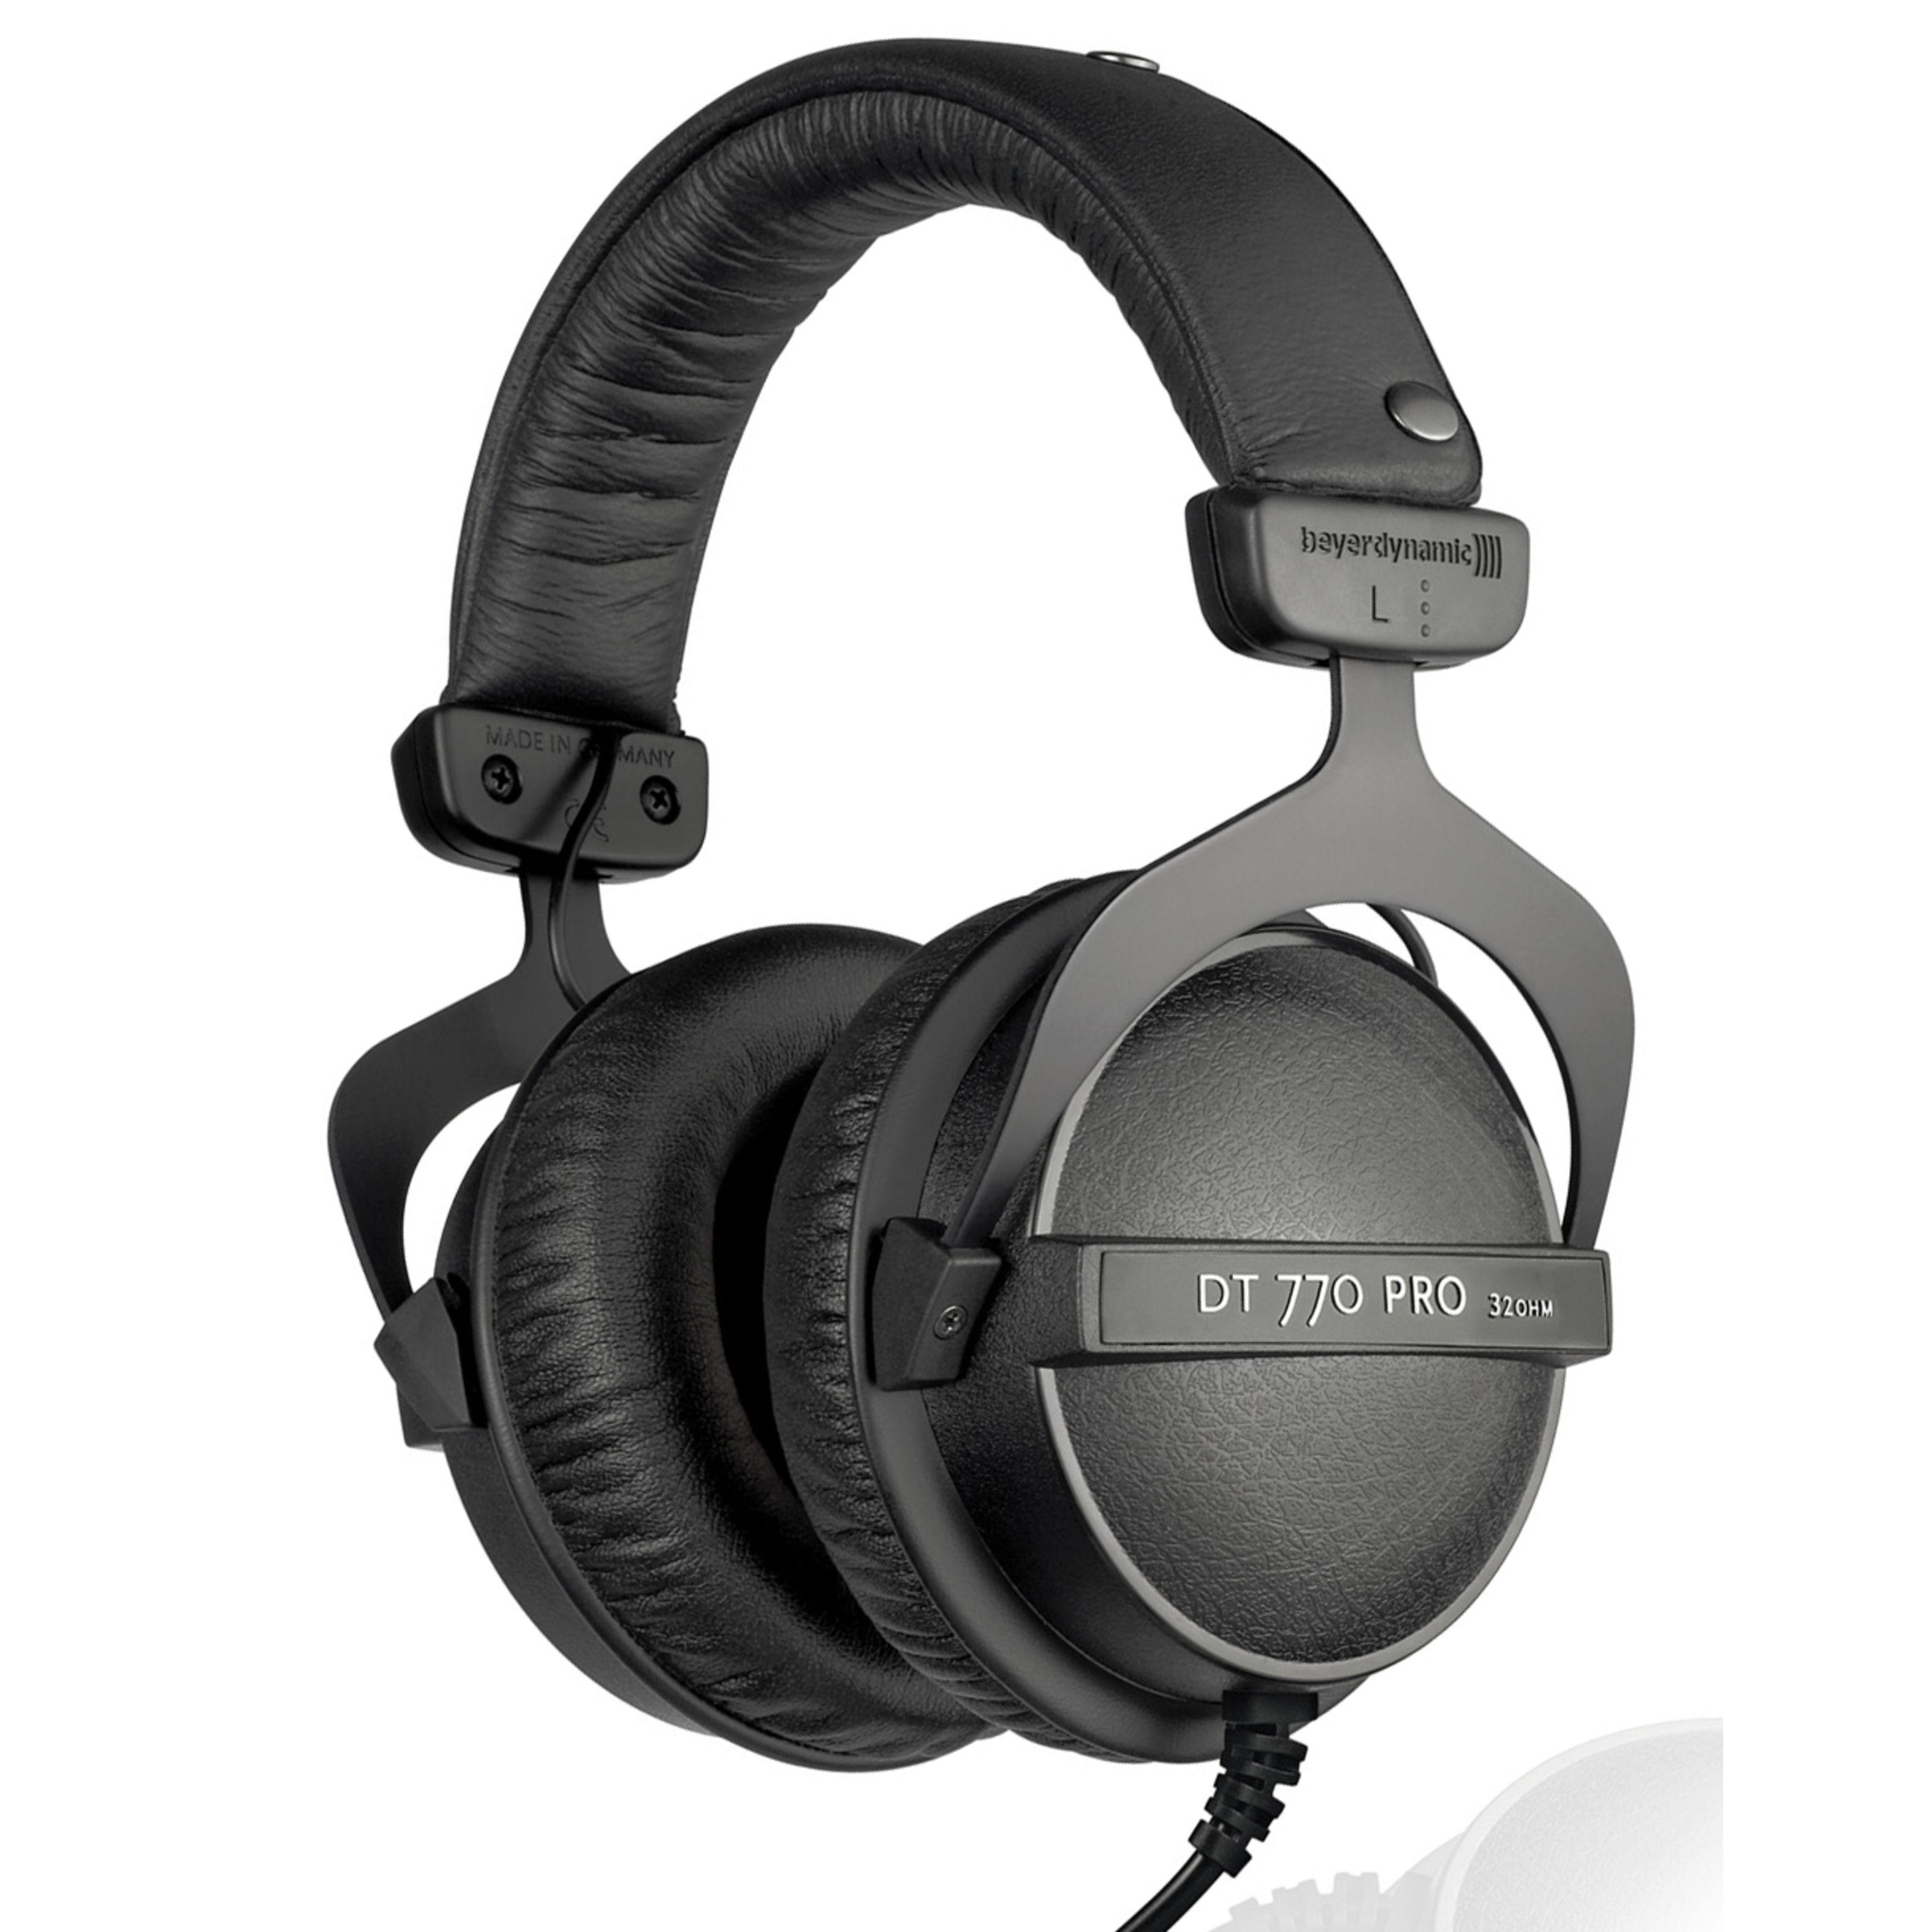 beyerdynamic - DT 770 PRO/32 Studiokopfhörer geschlossen, 32ohm